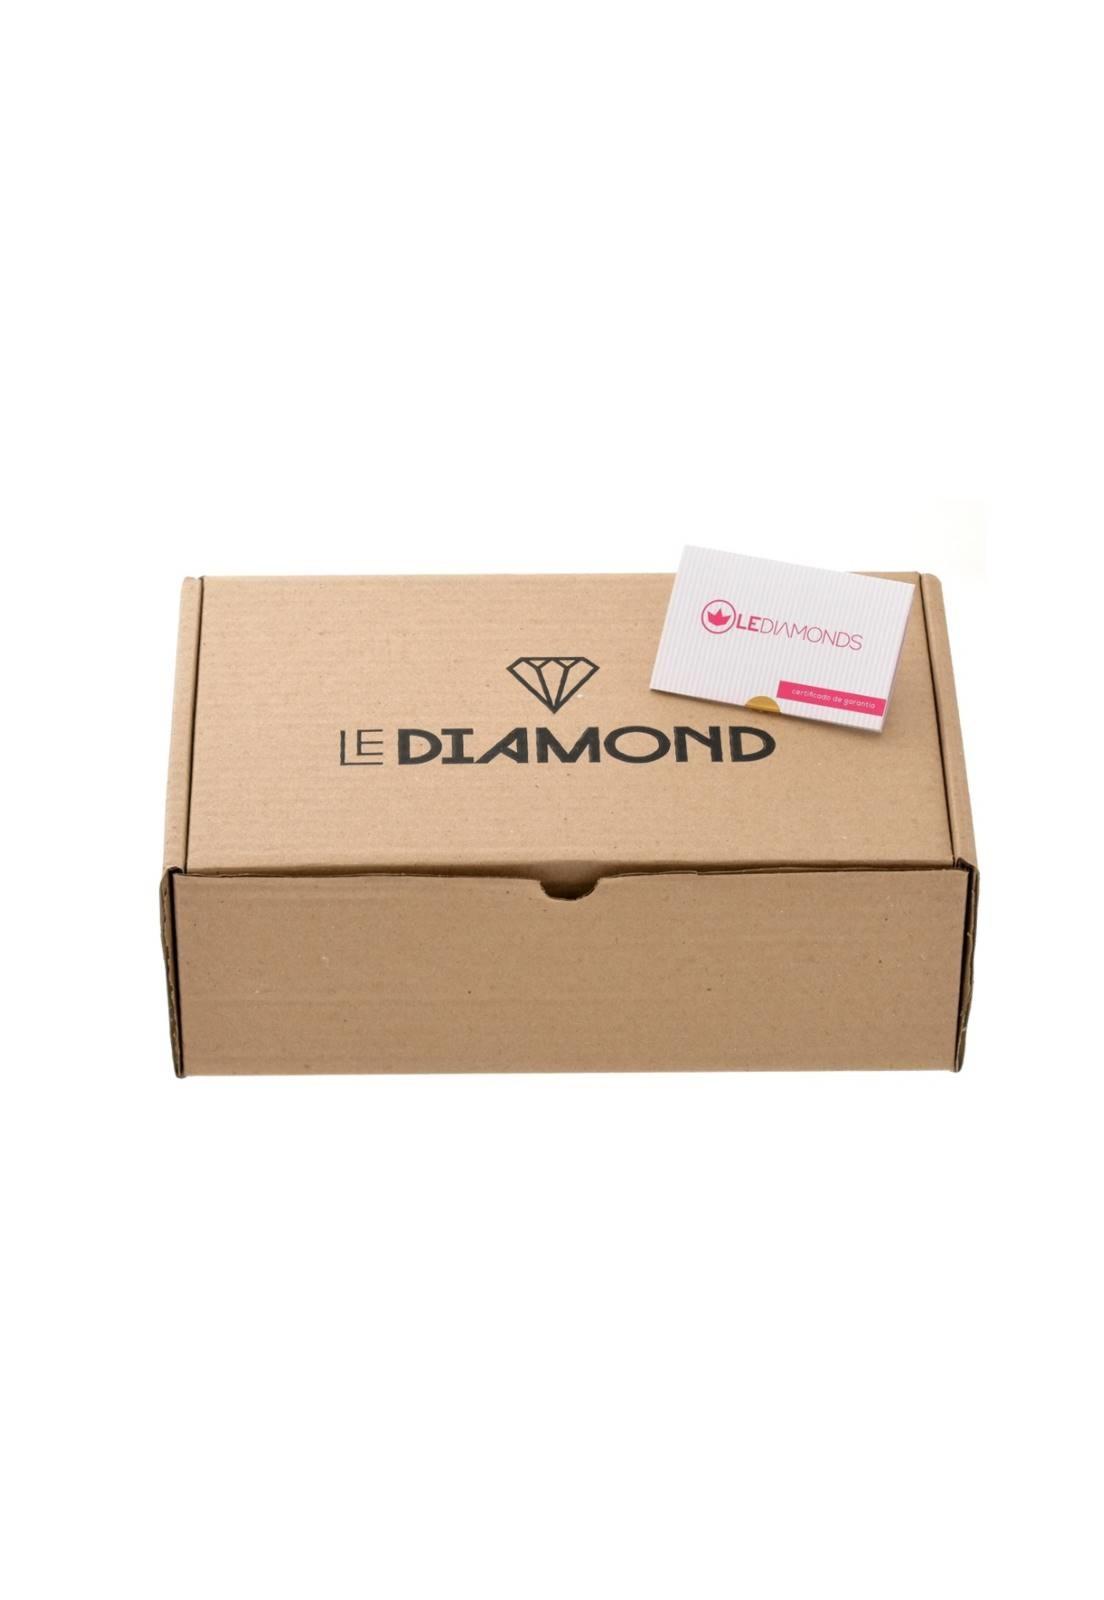 Colar Le Diamond Cristal com Fecho Boia e Camélia Dourada